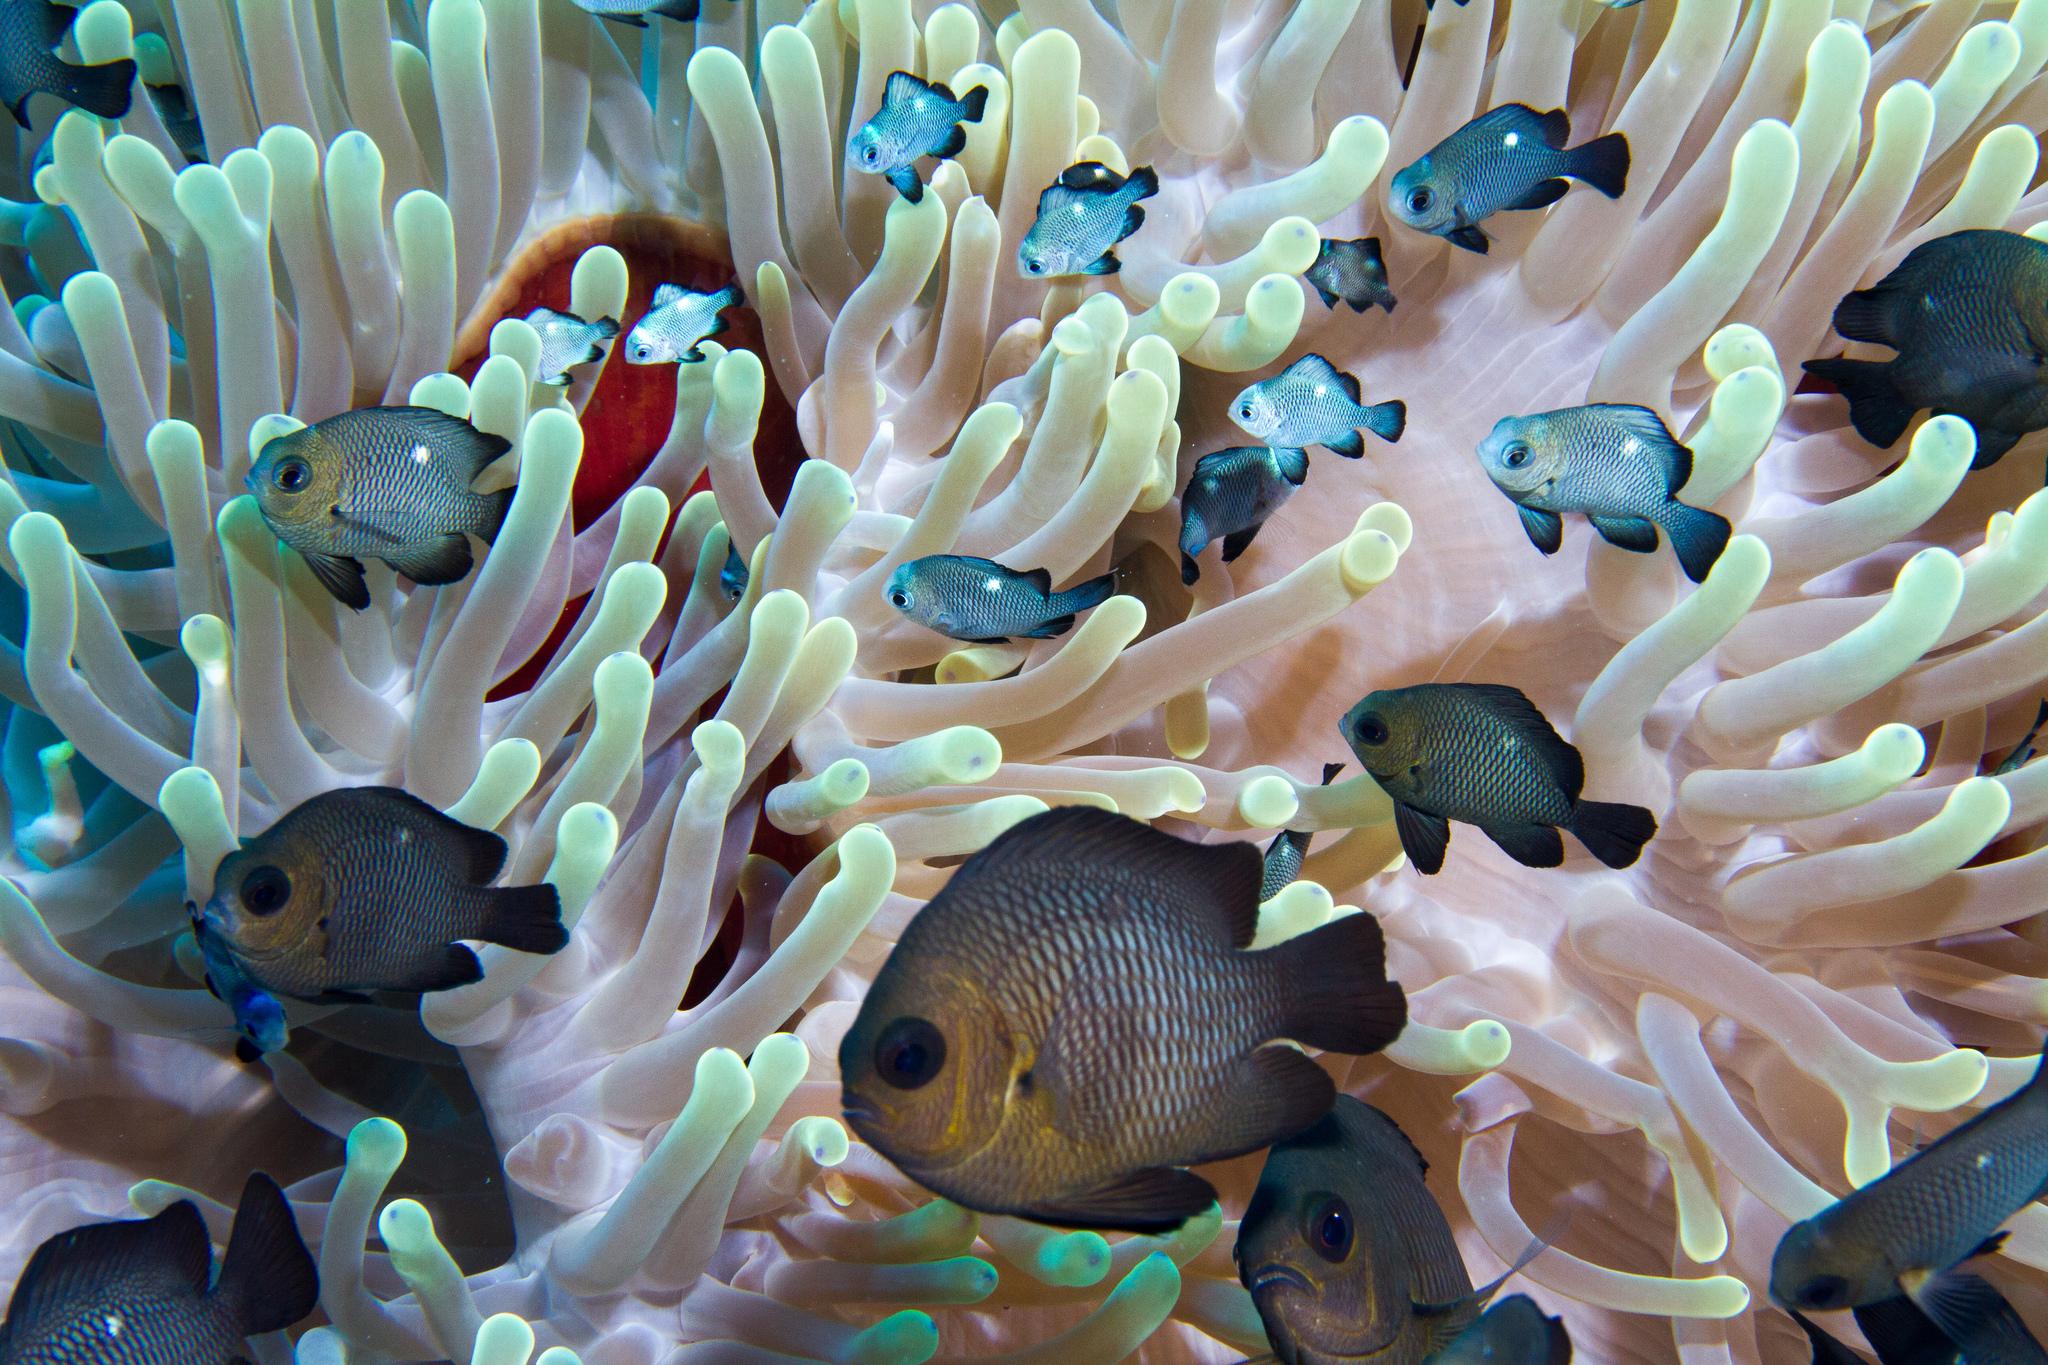 Dascyllus trimaculatus, Red Sea. Credit: Plongez Pepere